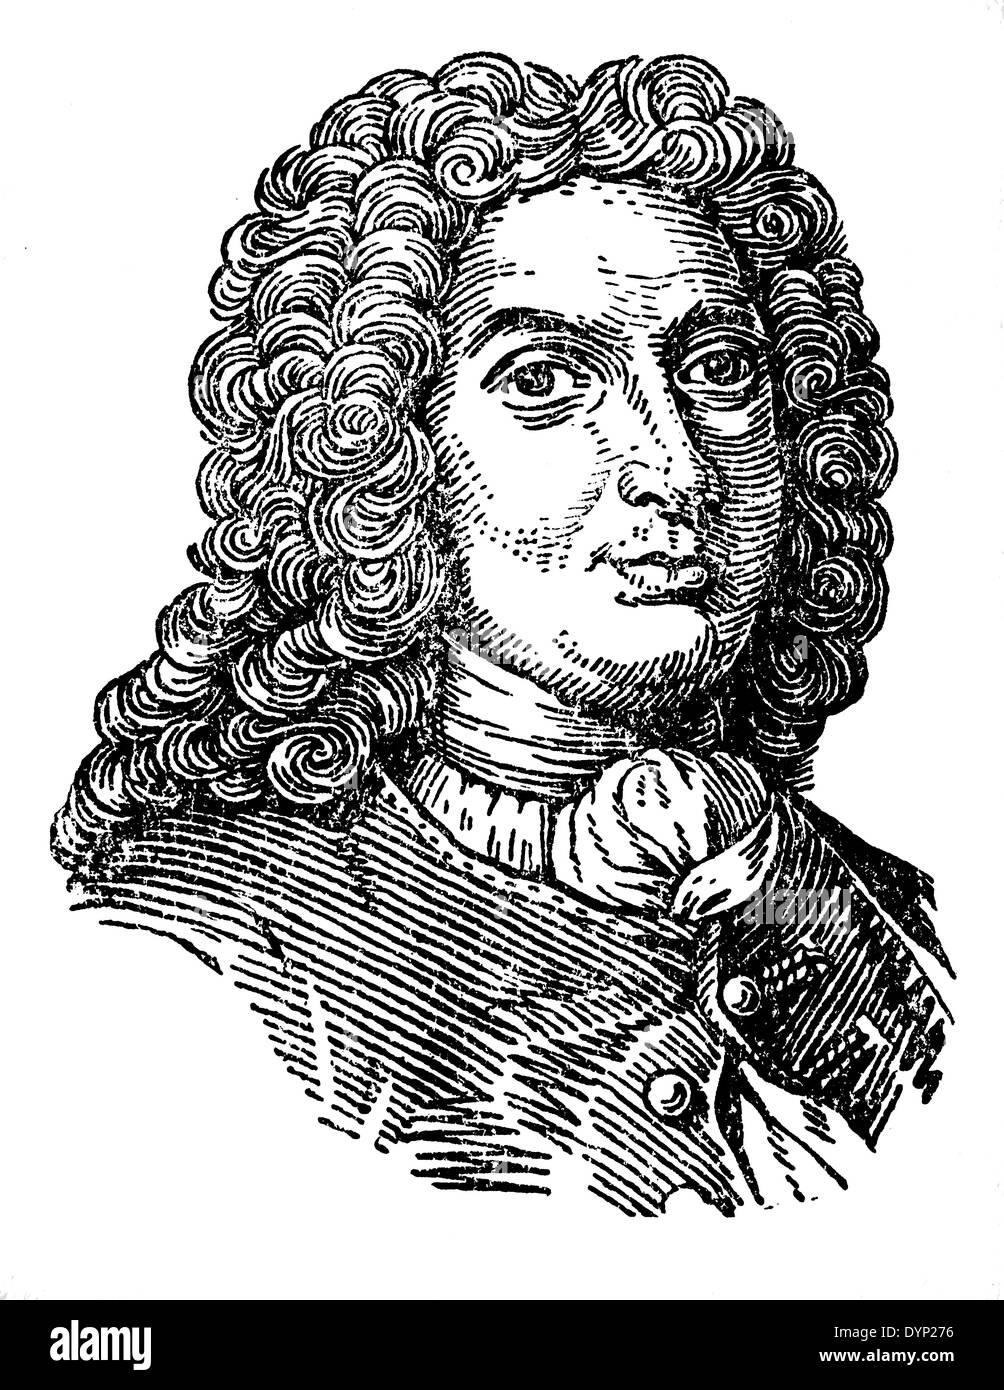 Johann Bernoulli (1667-1748), Swiss mathematician, illustration from Soviet encyclopedia, 1927 - Stock Image